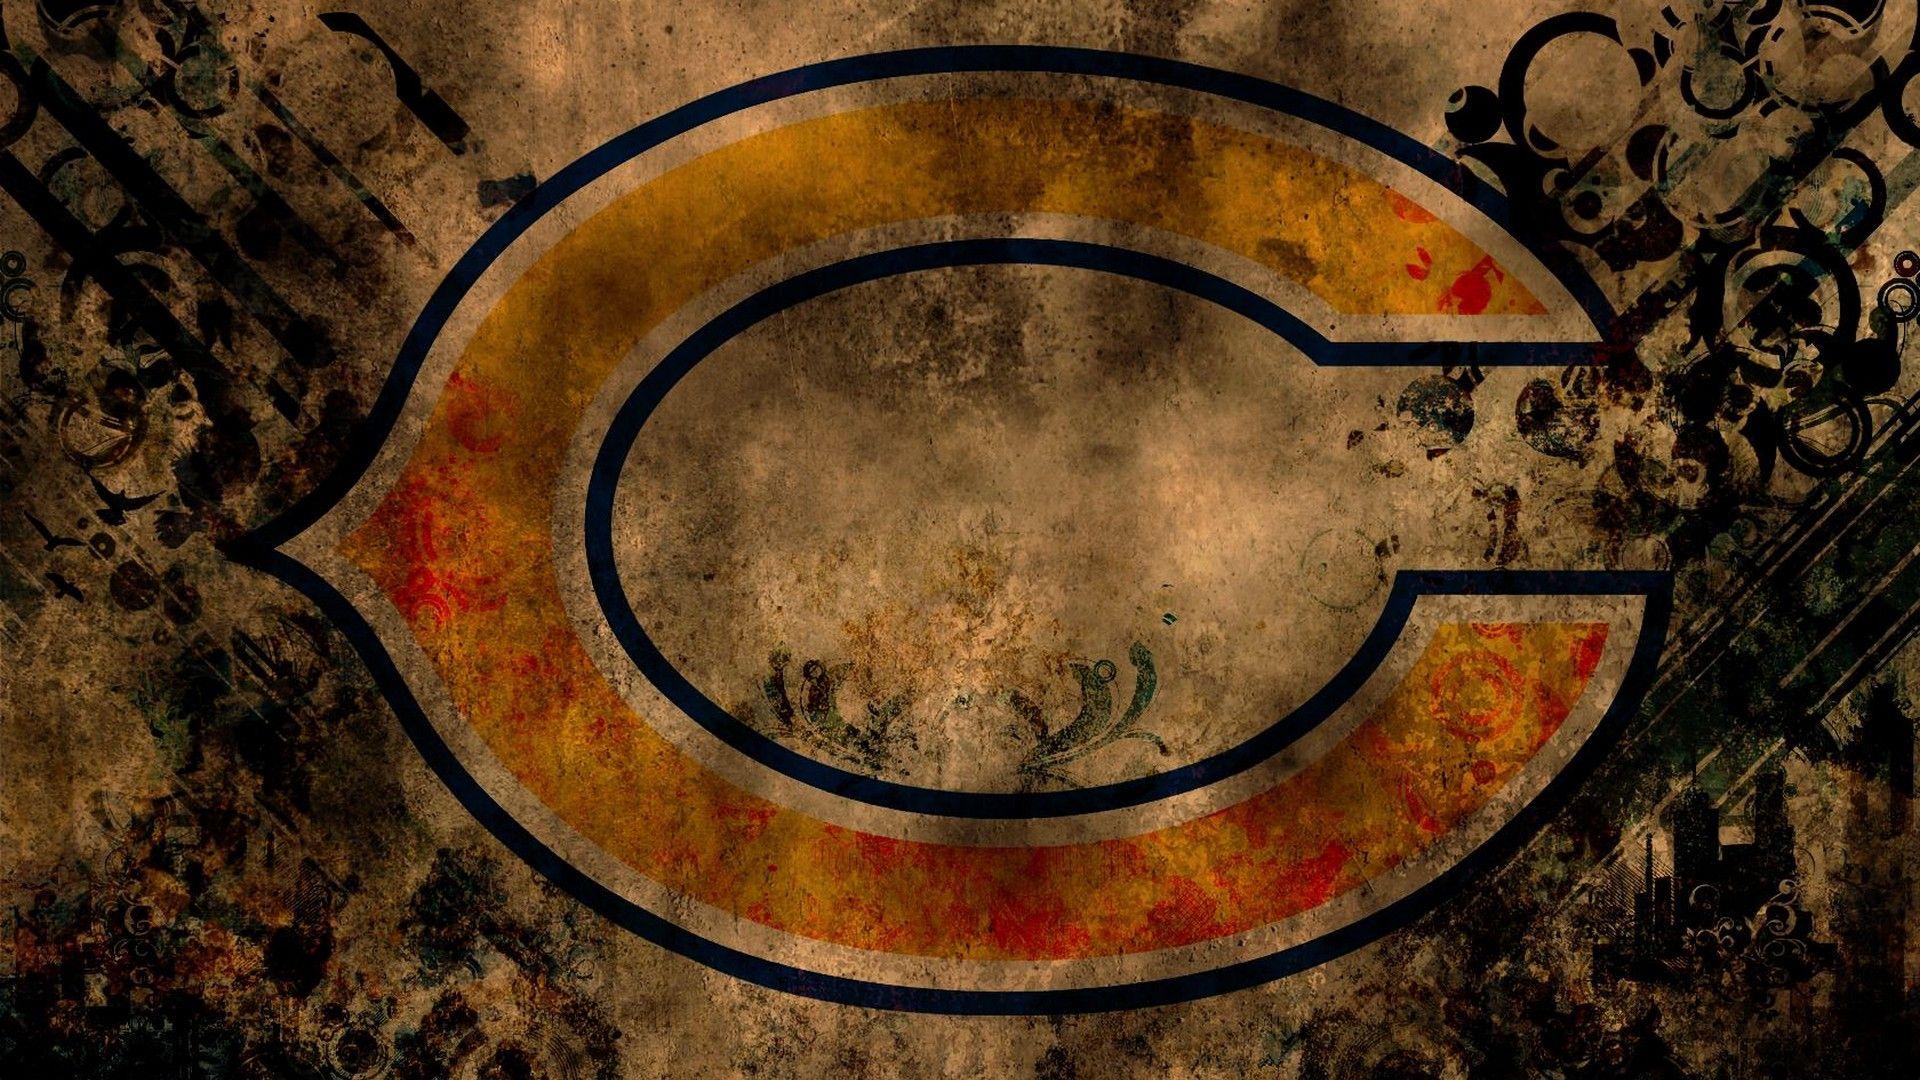 Hd Backgrounds Chicago Bears Nfl Football Wallpaper Hd